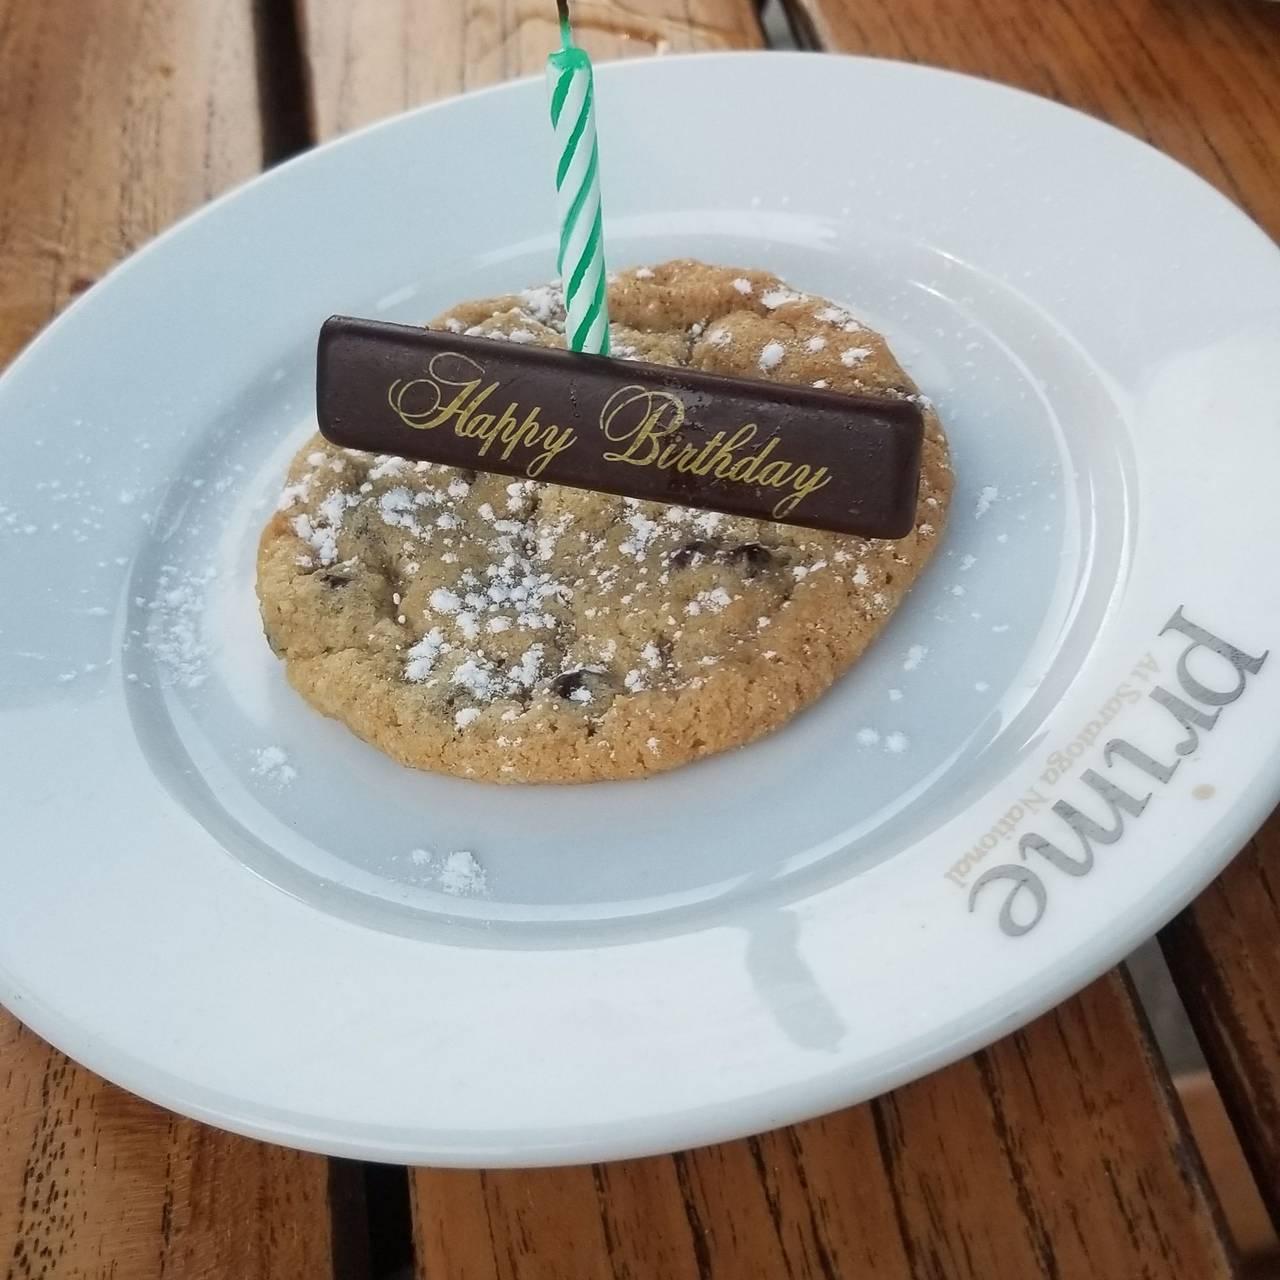 Prime at Saratoga National Restaurant - Saratoga Springs, NY | OpenTable